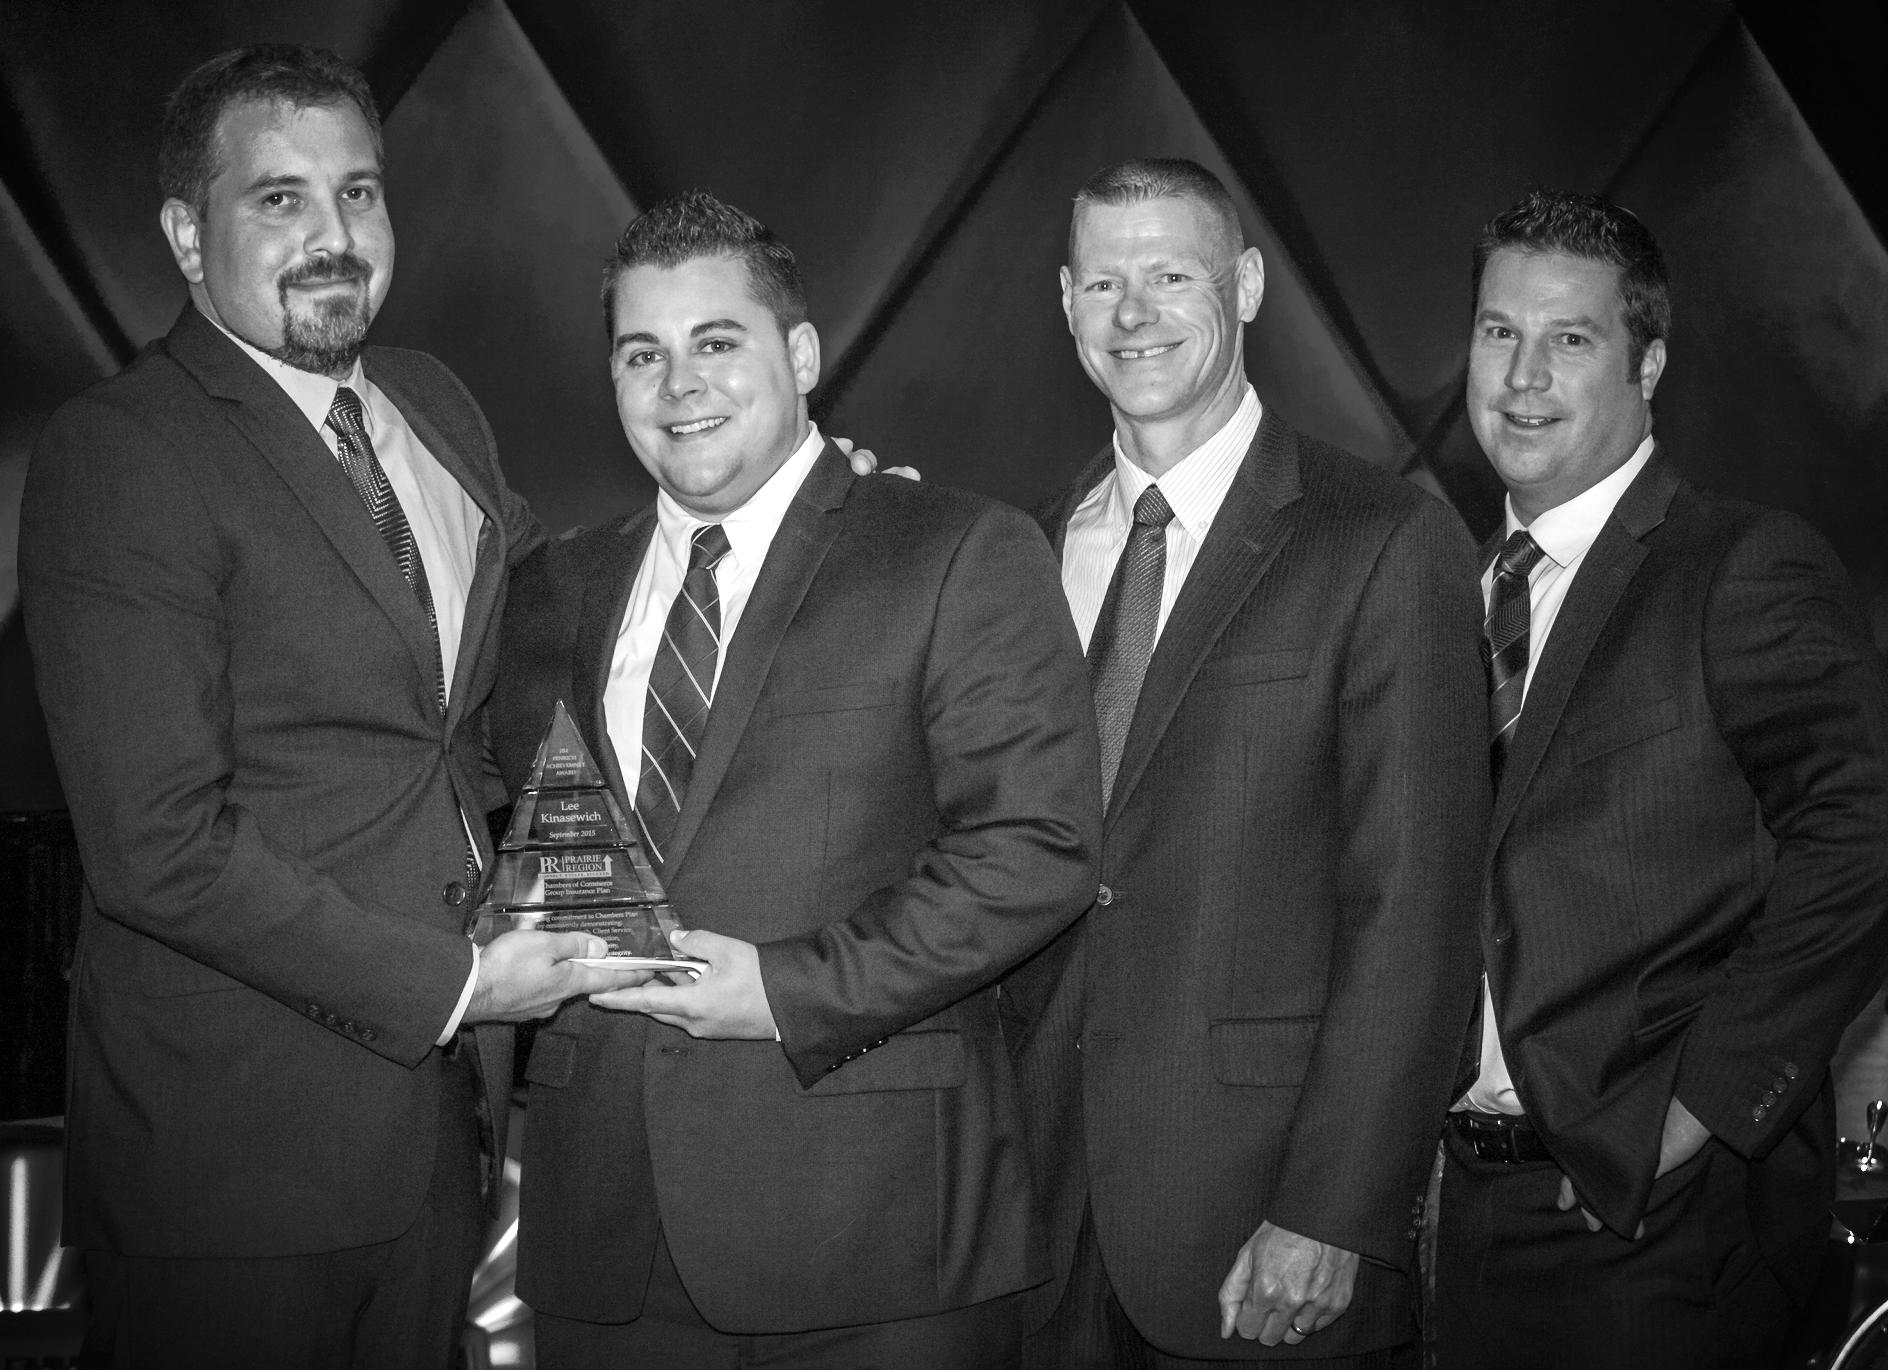 Kyle Fenrich &Lee Kinasewich, Gold Key Benefits Advisors;Ken Willoughby, Regional Marketing Director; Garet Stewart, Gold Key Benefits Advisor